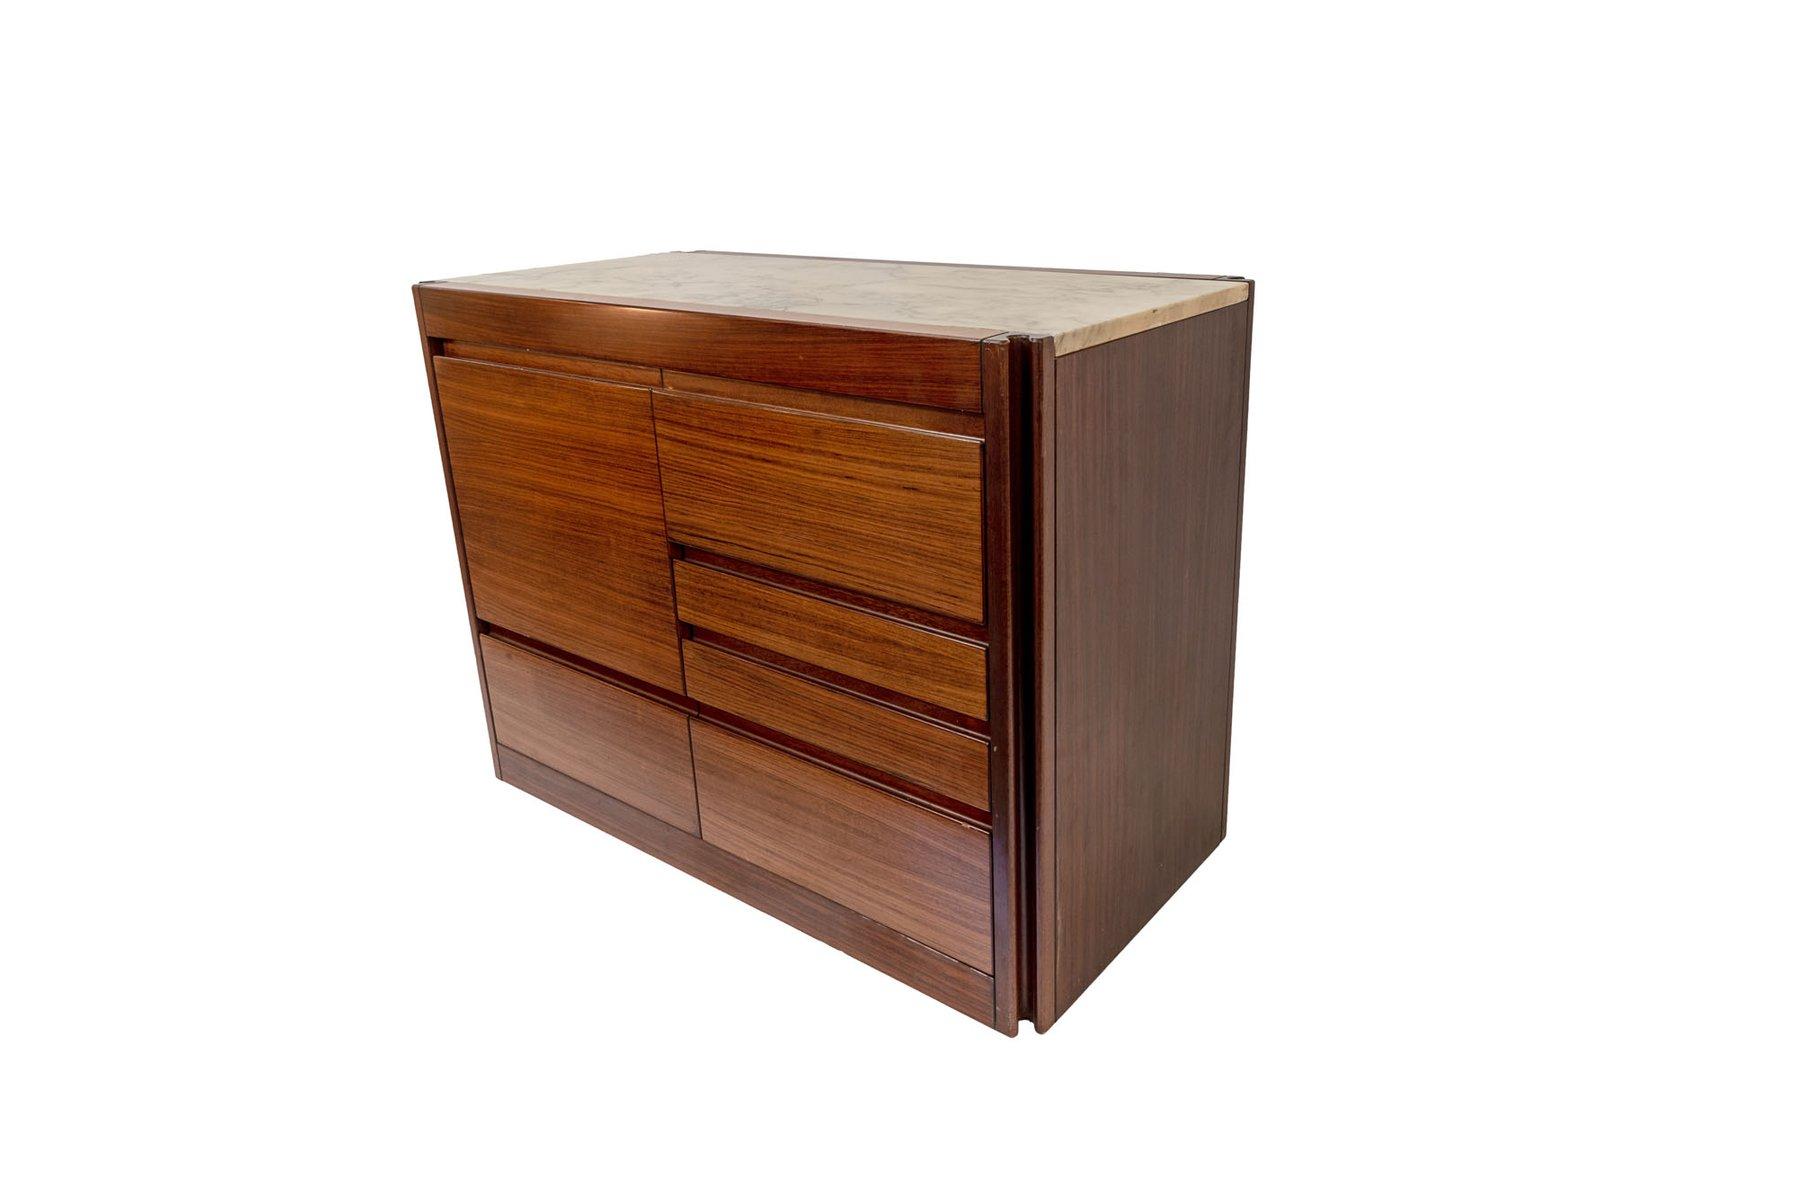 Sideboard aus Holz & Marmor von Angelo Mangiarotti, 1970er